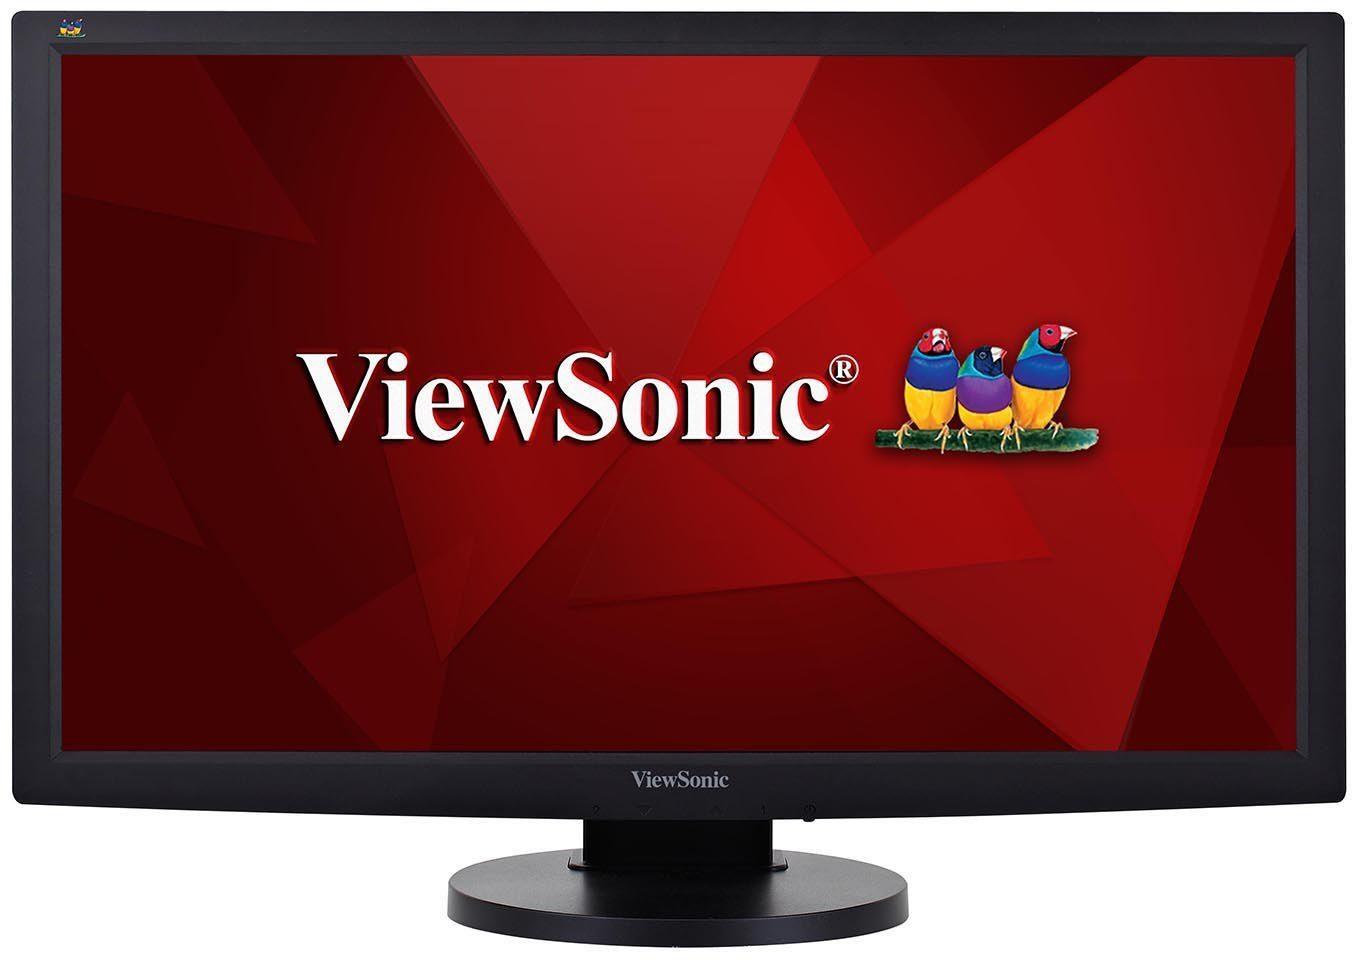 "ViewSonic Desktop Display »VG2233-LED 22"" 1920X1080 FULL HD«"